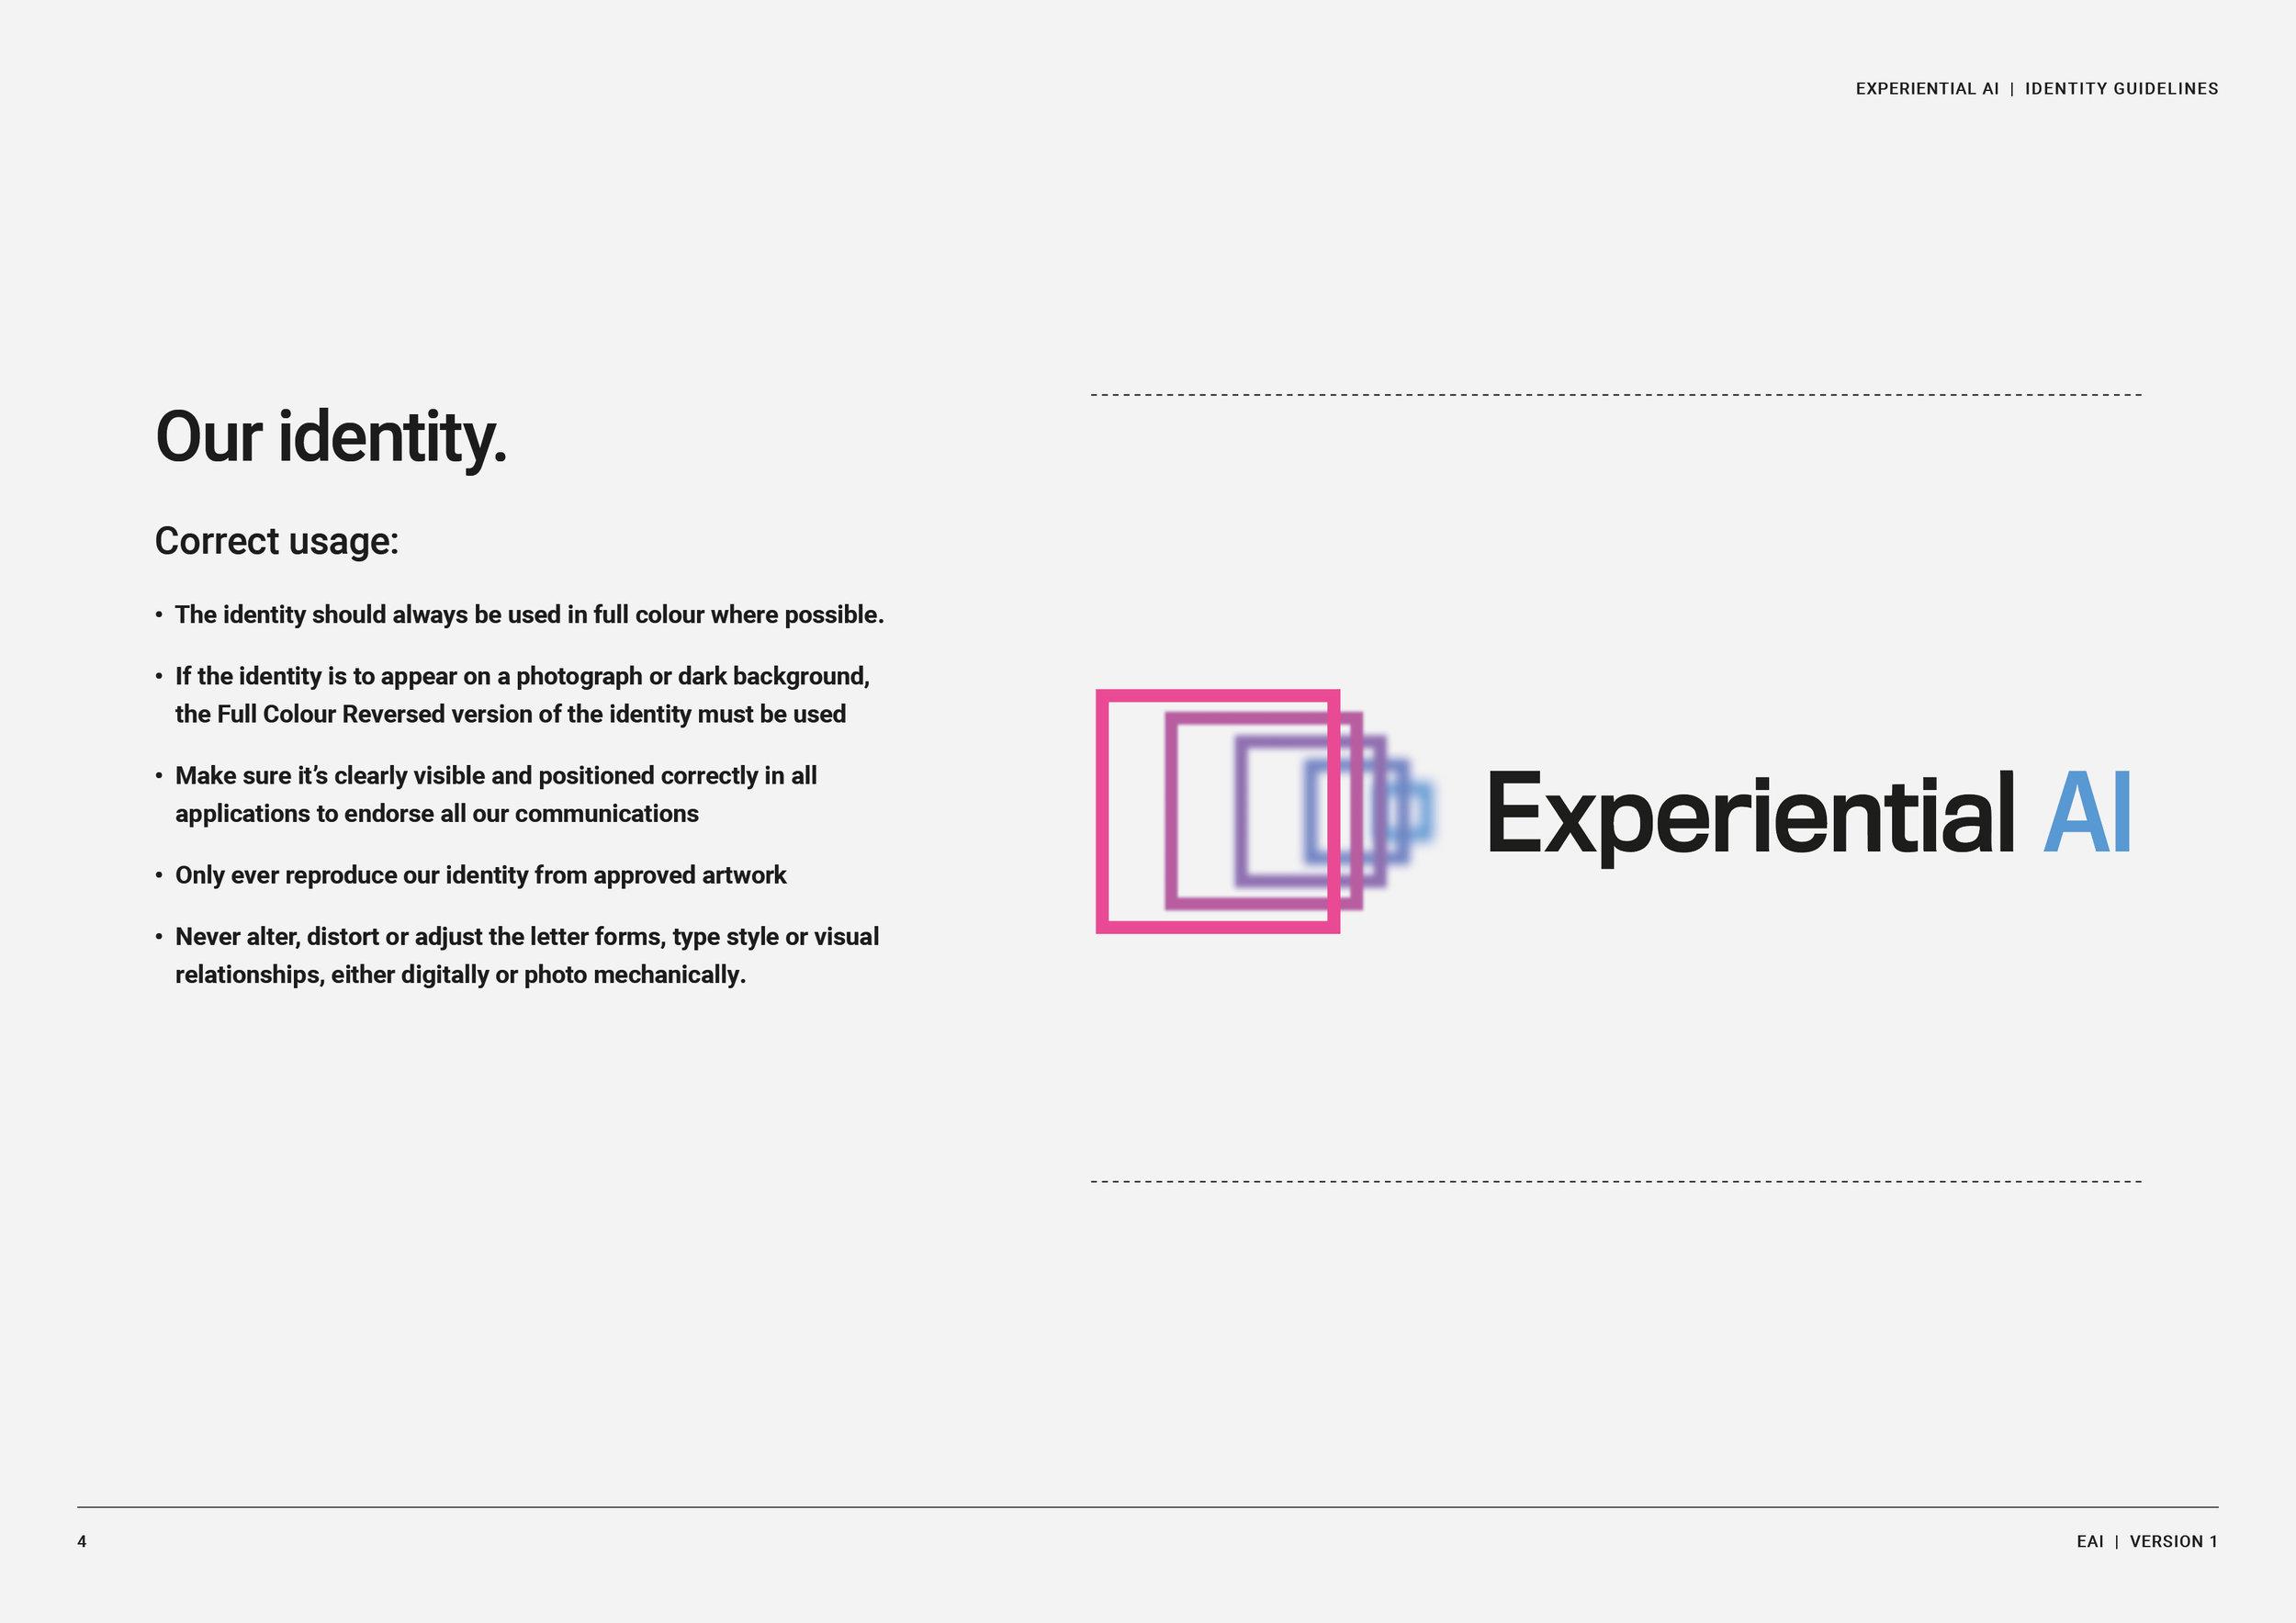 EAI_Identity_Guidelines4.jpg